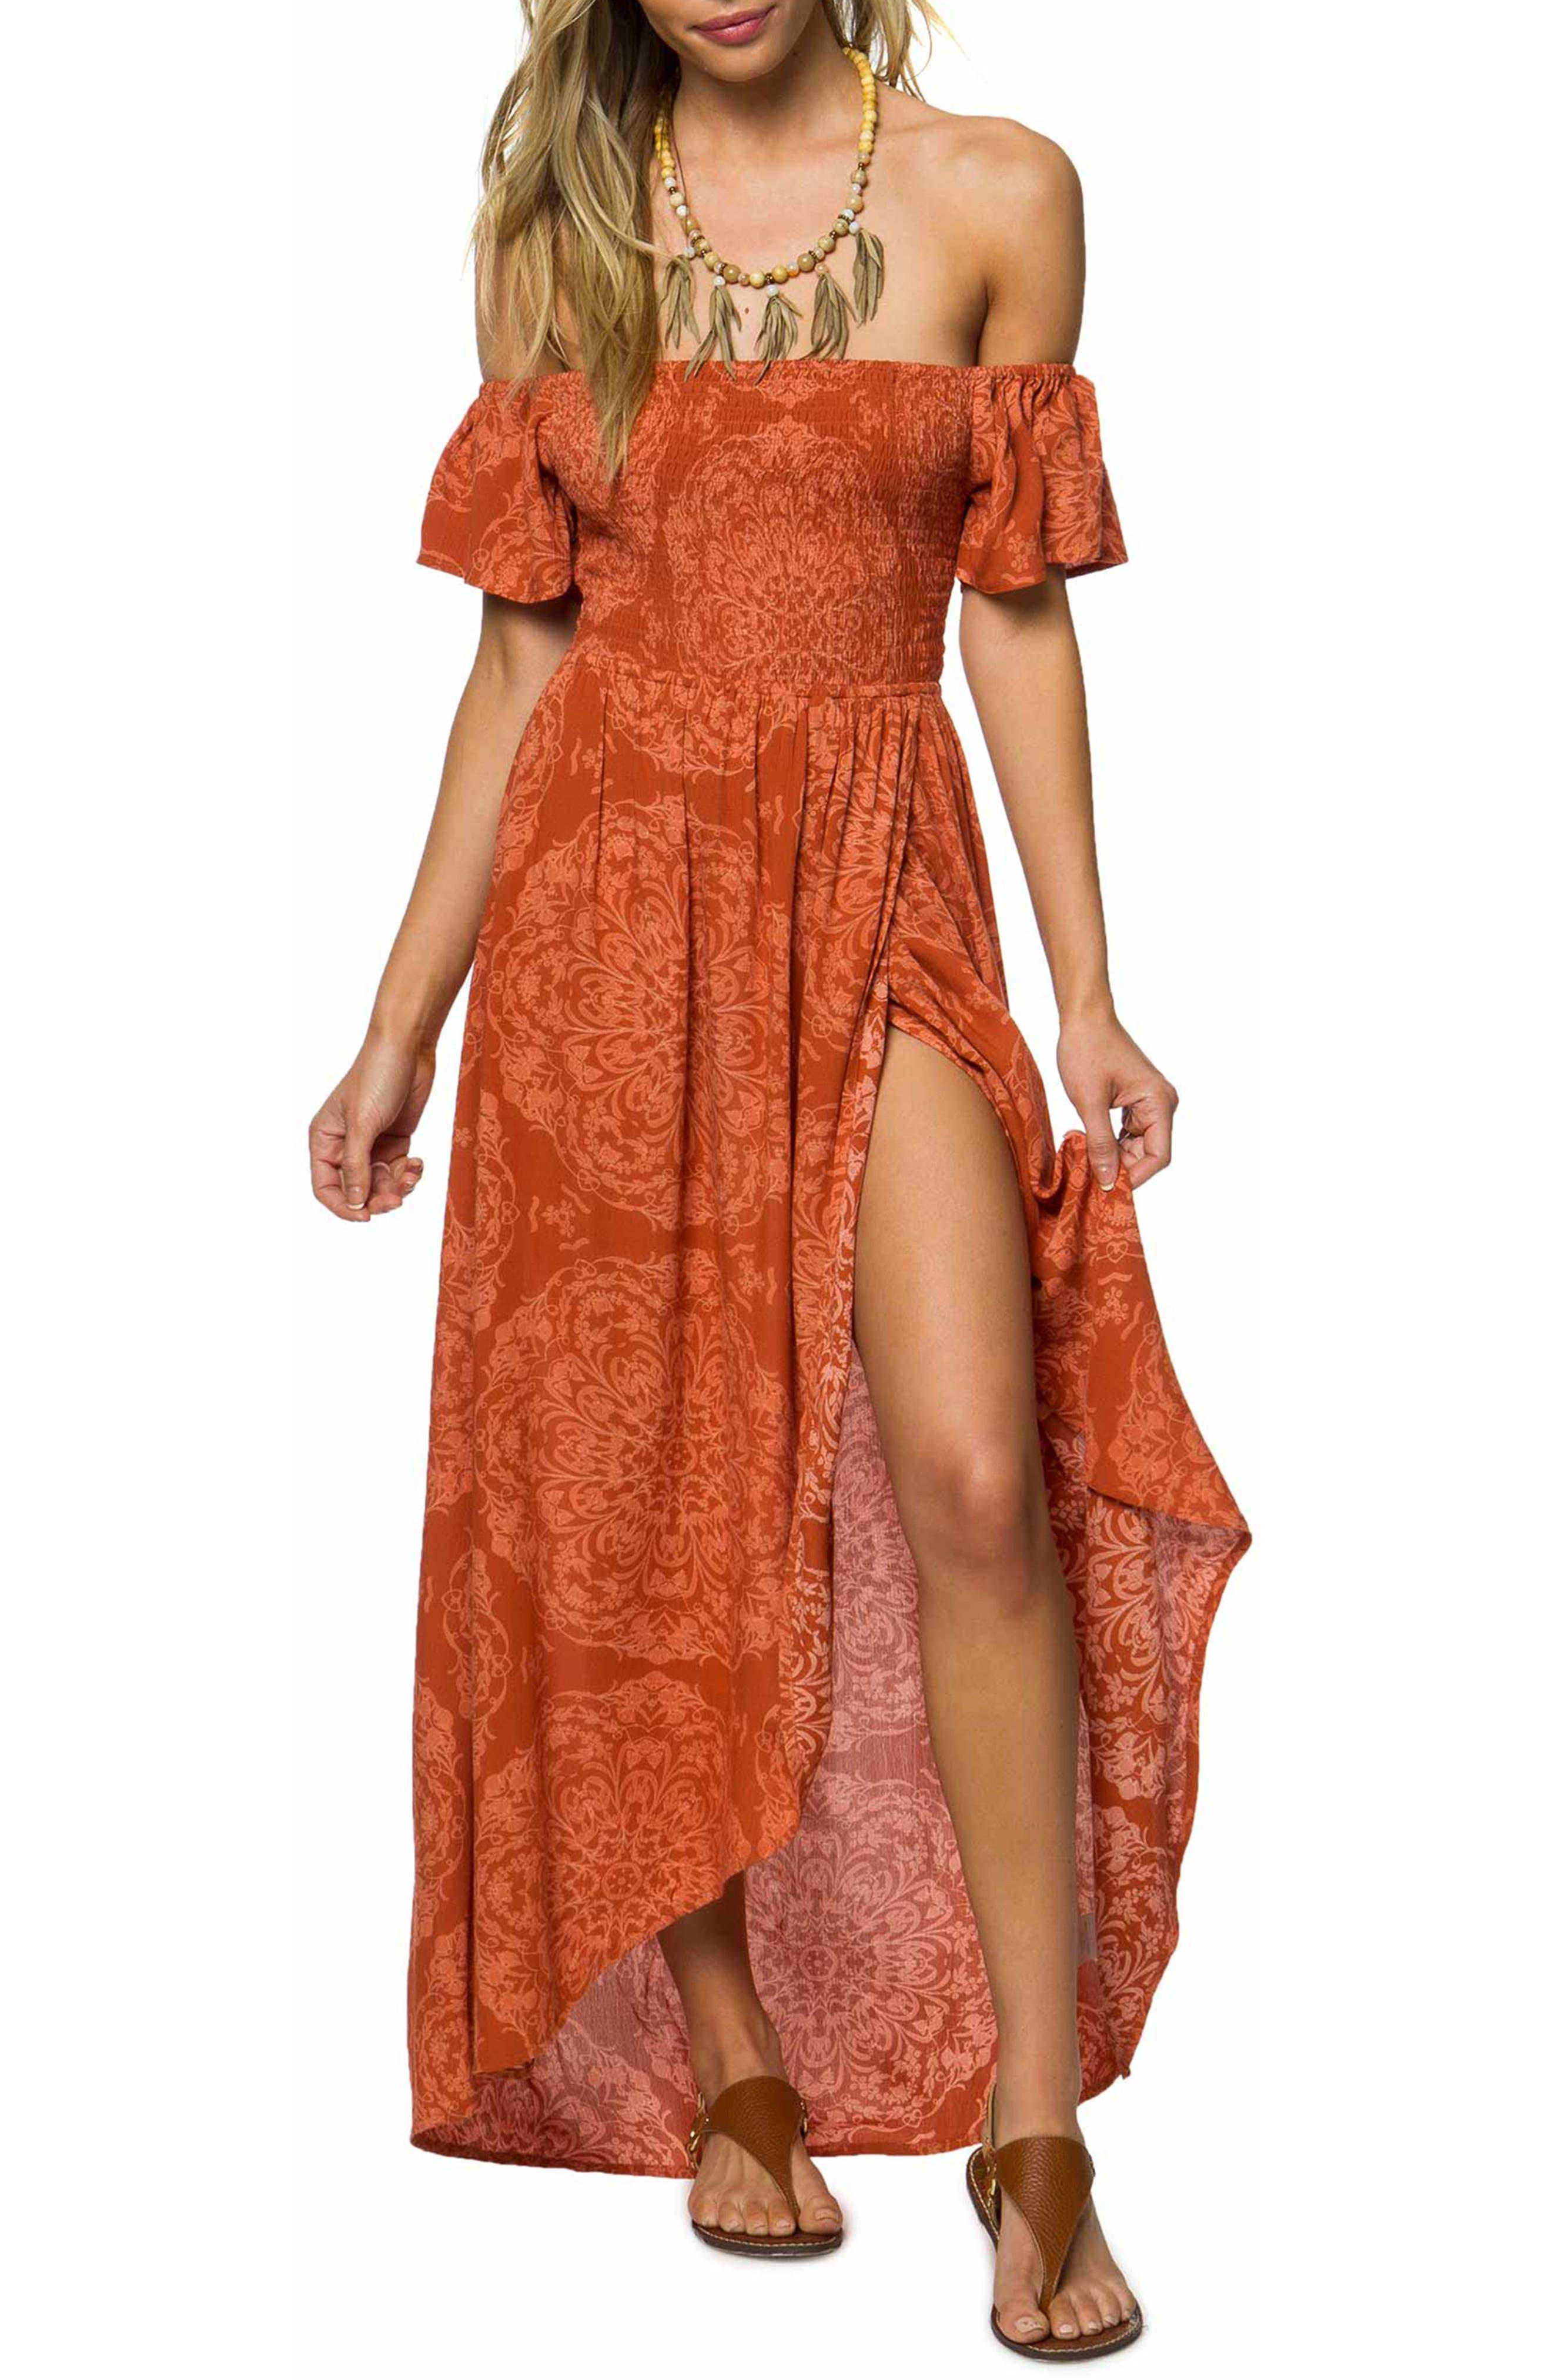 O'Neill Aviva Off the Shoulder Maxi Dress